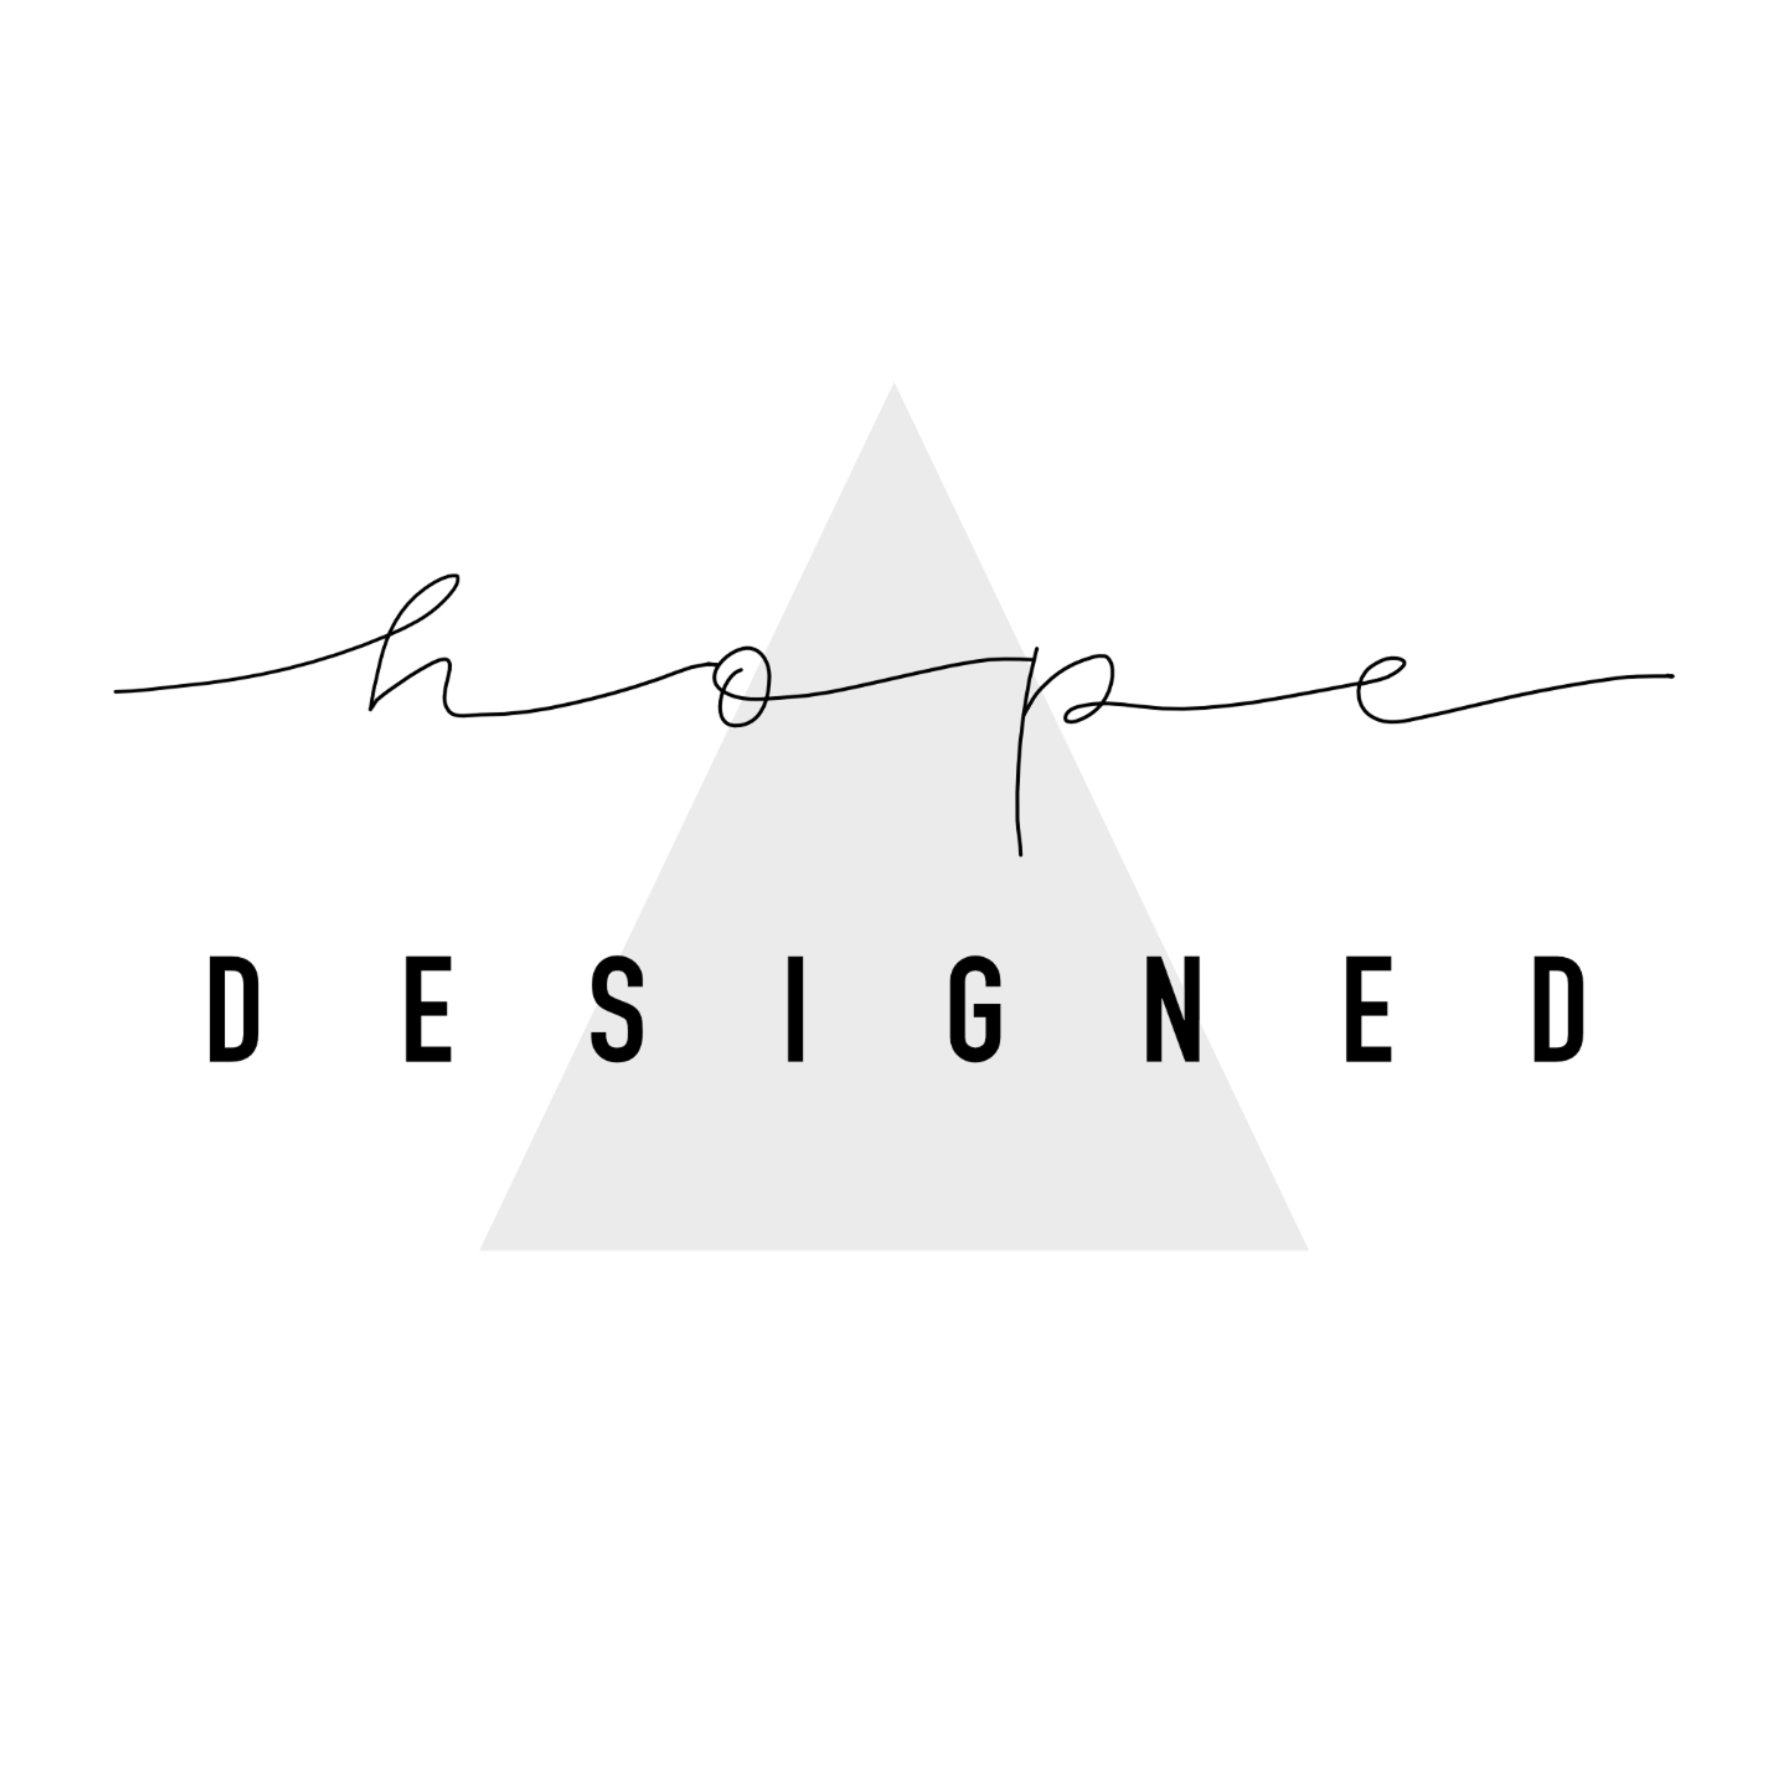 Hope designed